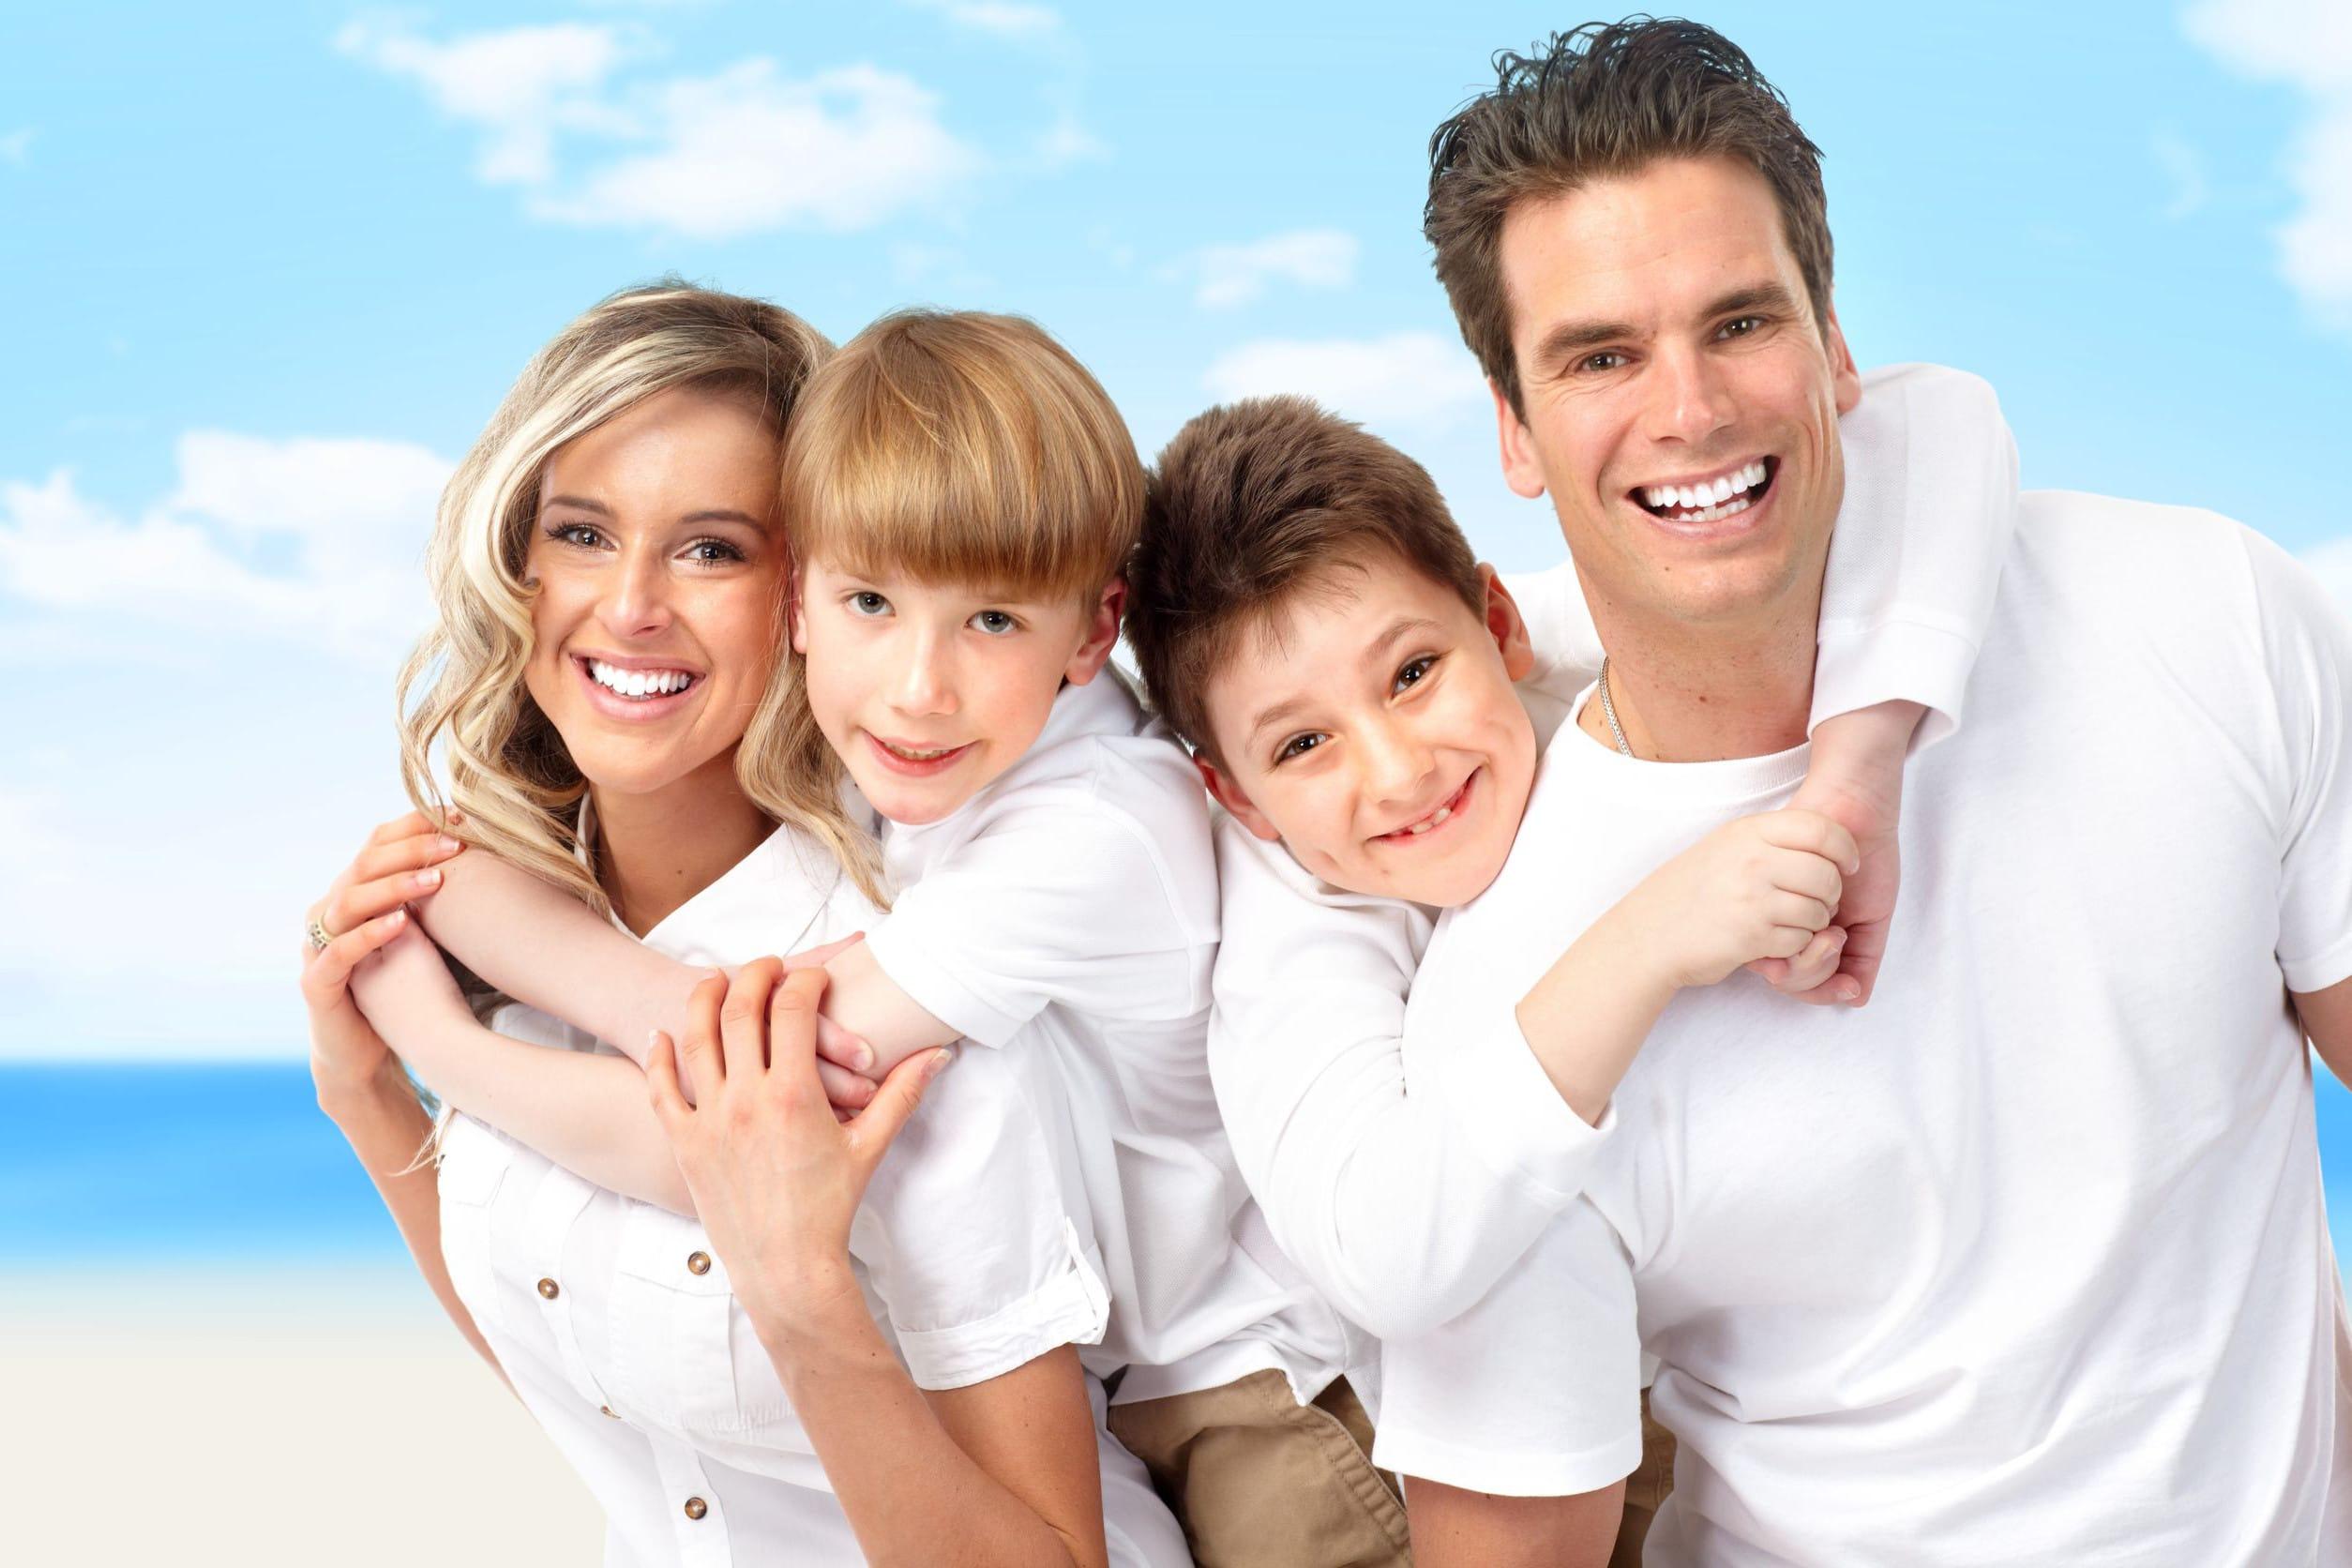 برنامج عائلي ماليزيا 9 ليالي 2000 $